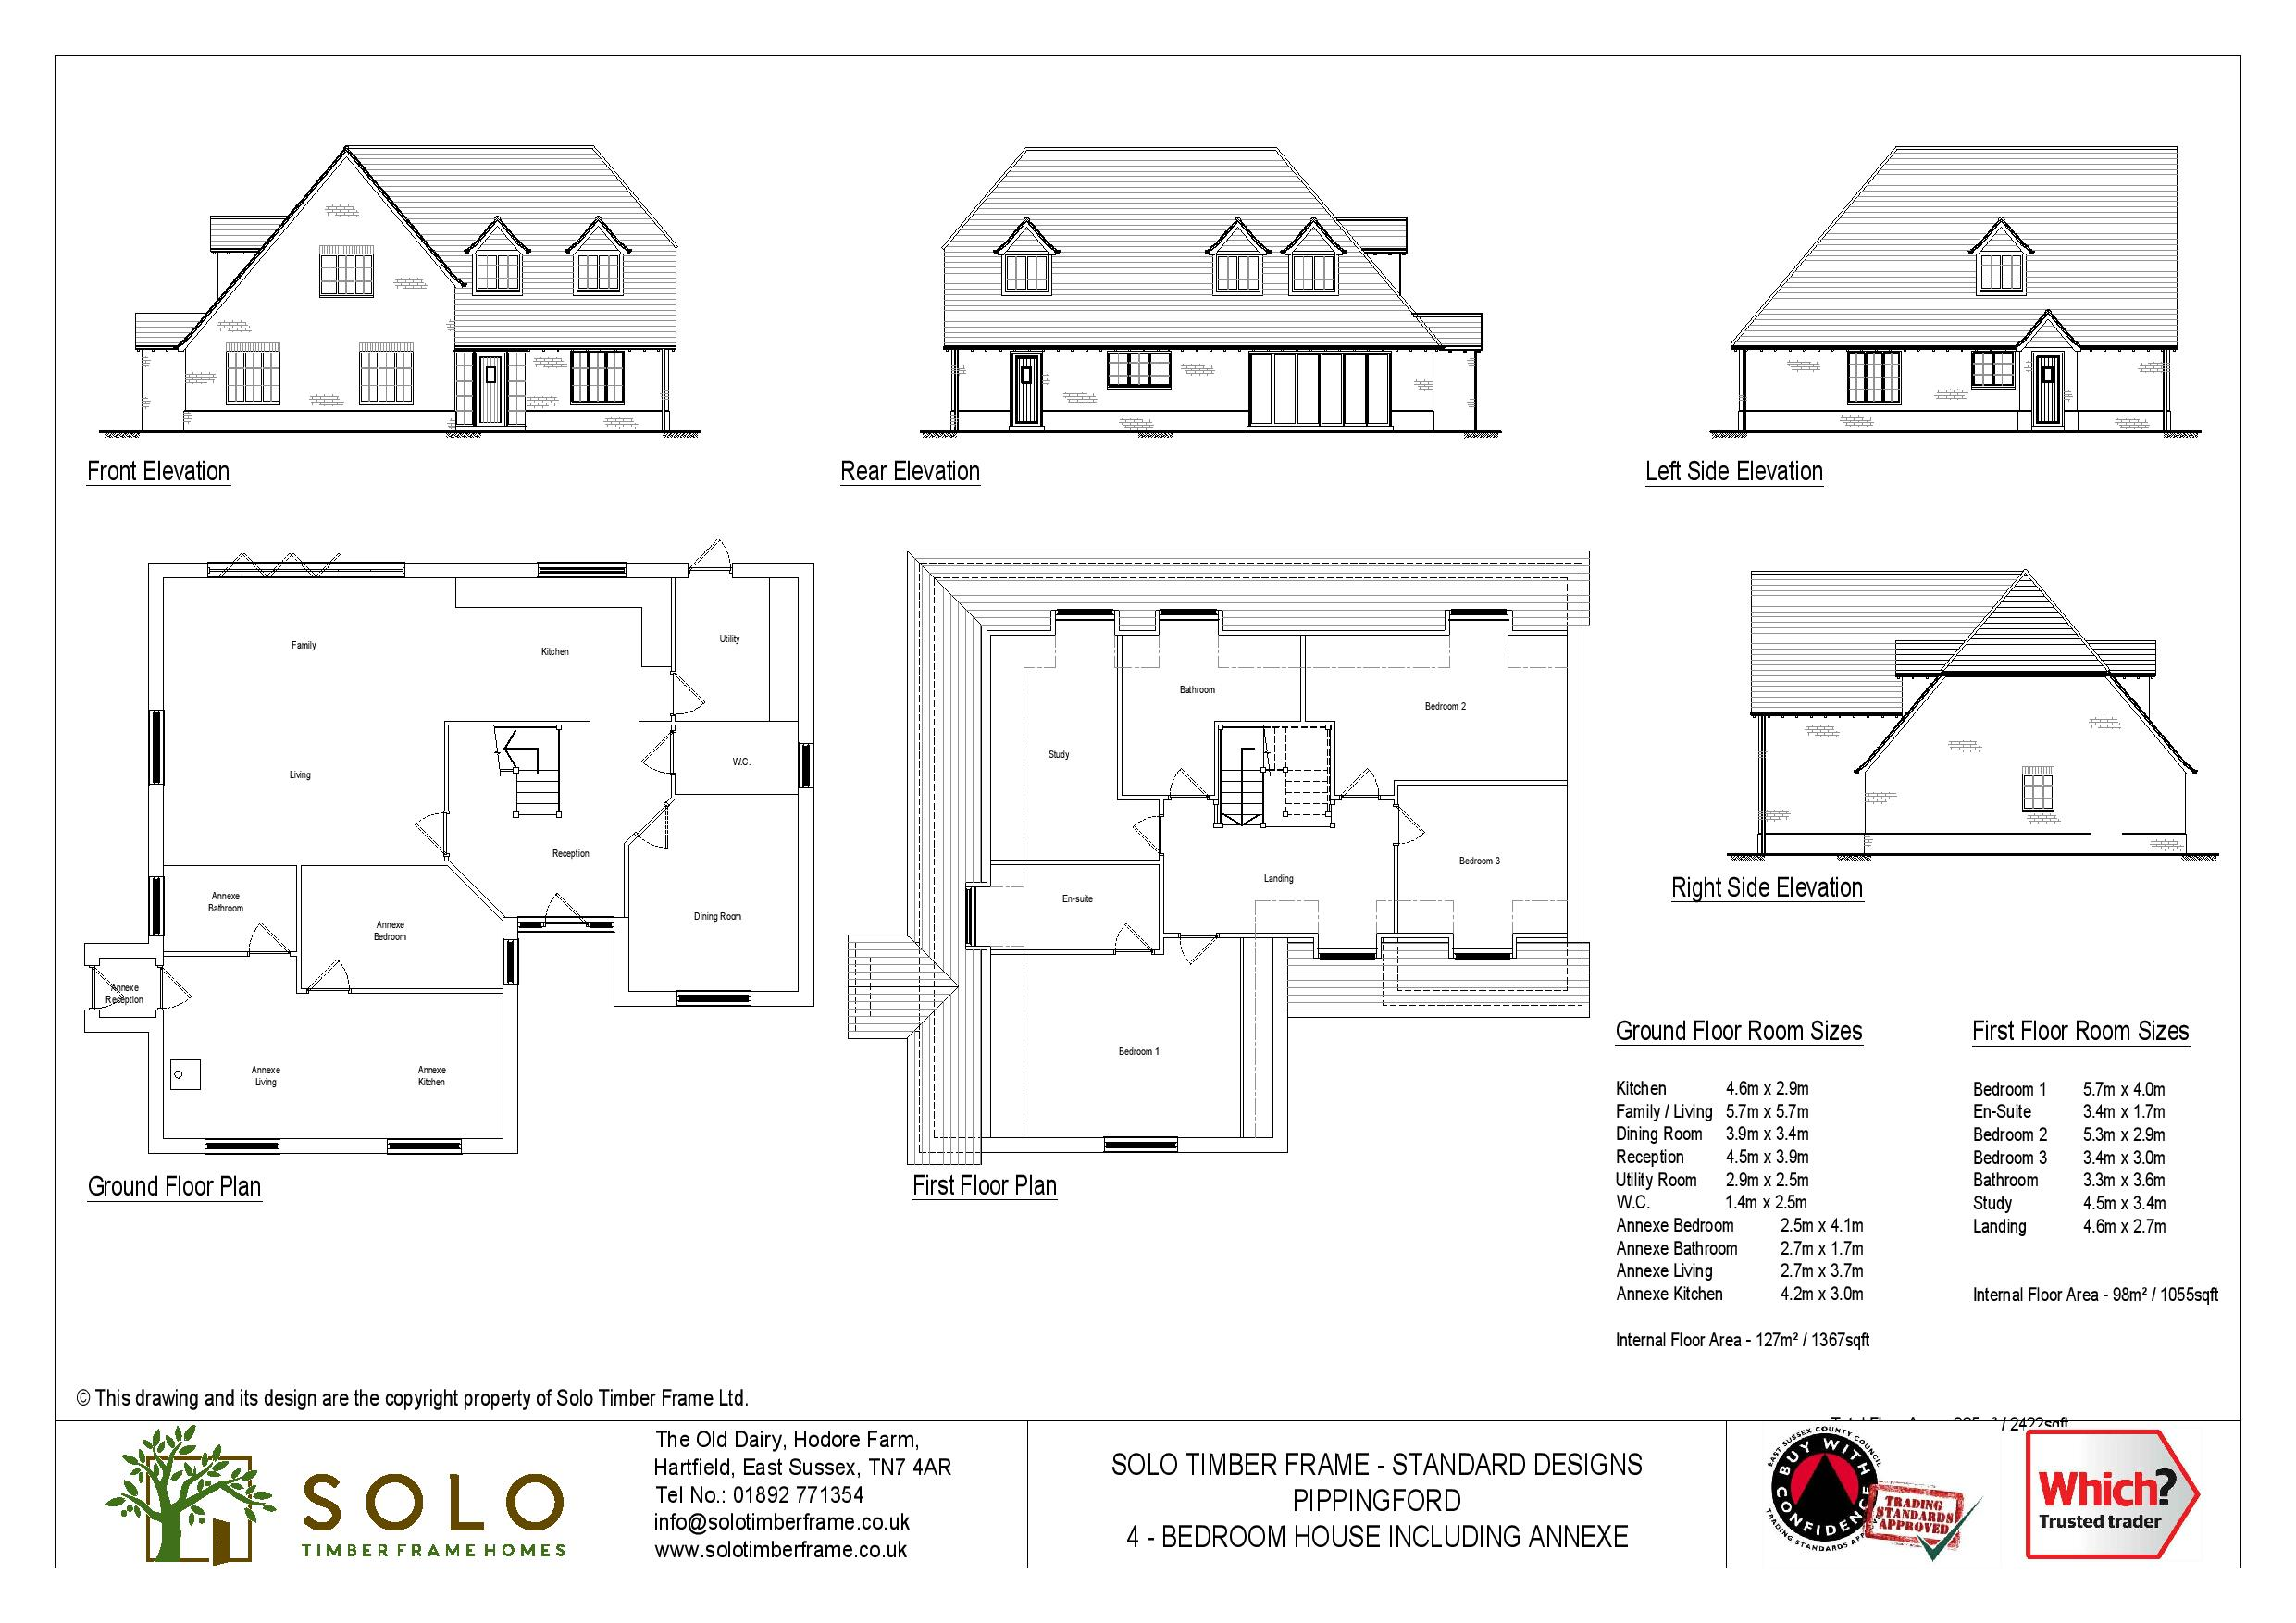 Pippingford 4 Bedroom Chalet Design